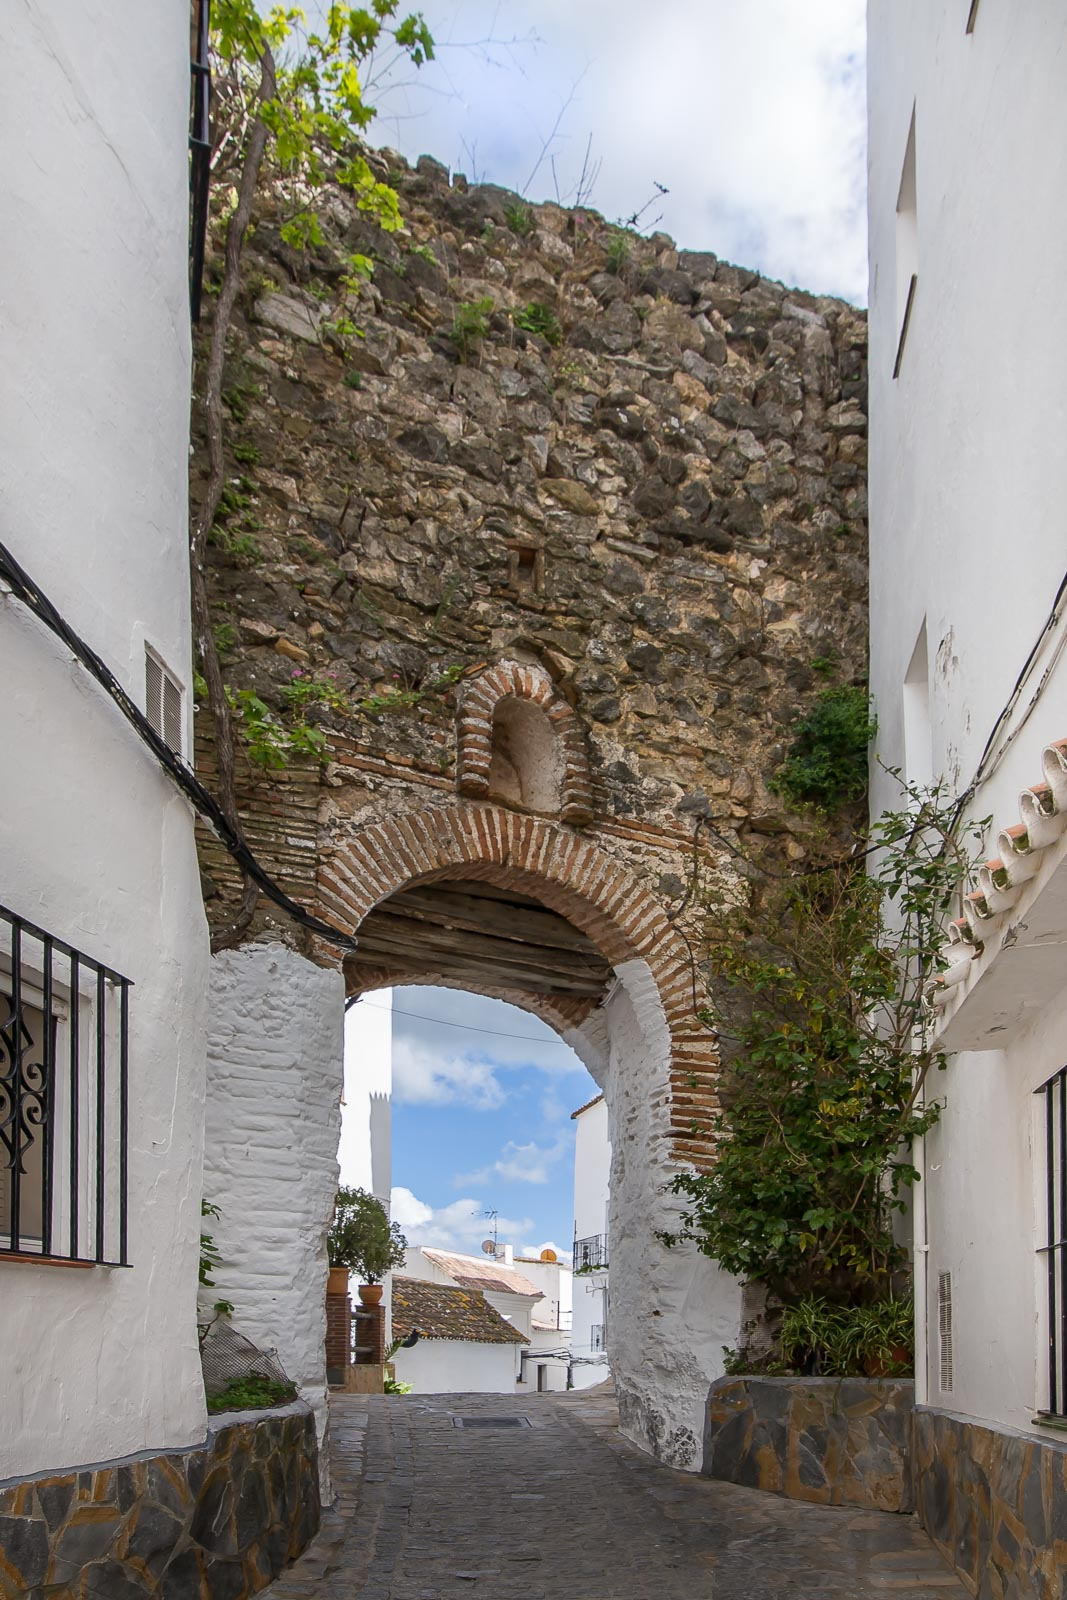 Puerta de la calle Arrabal (Casares)